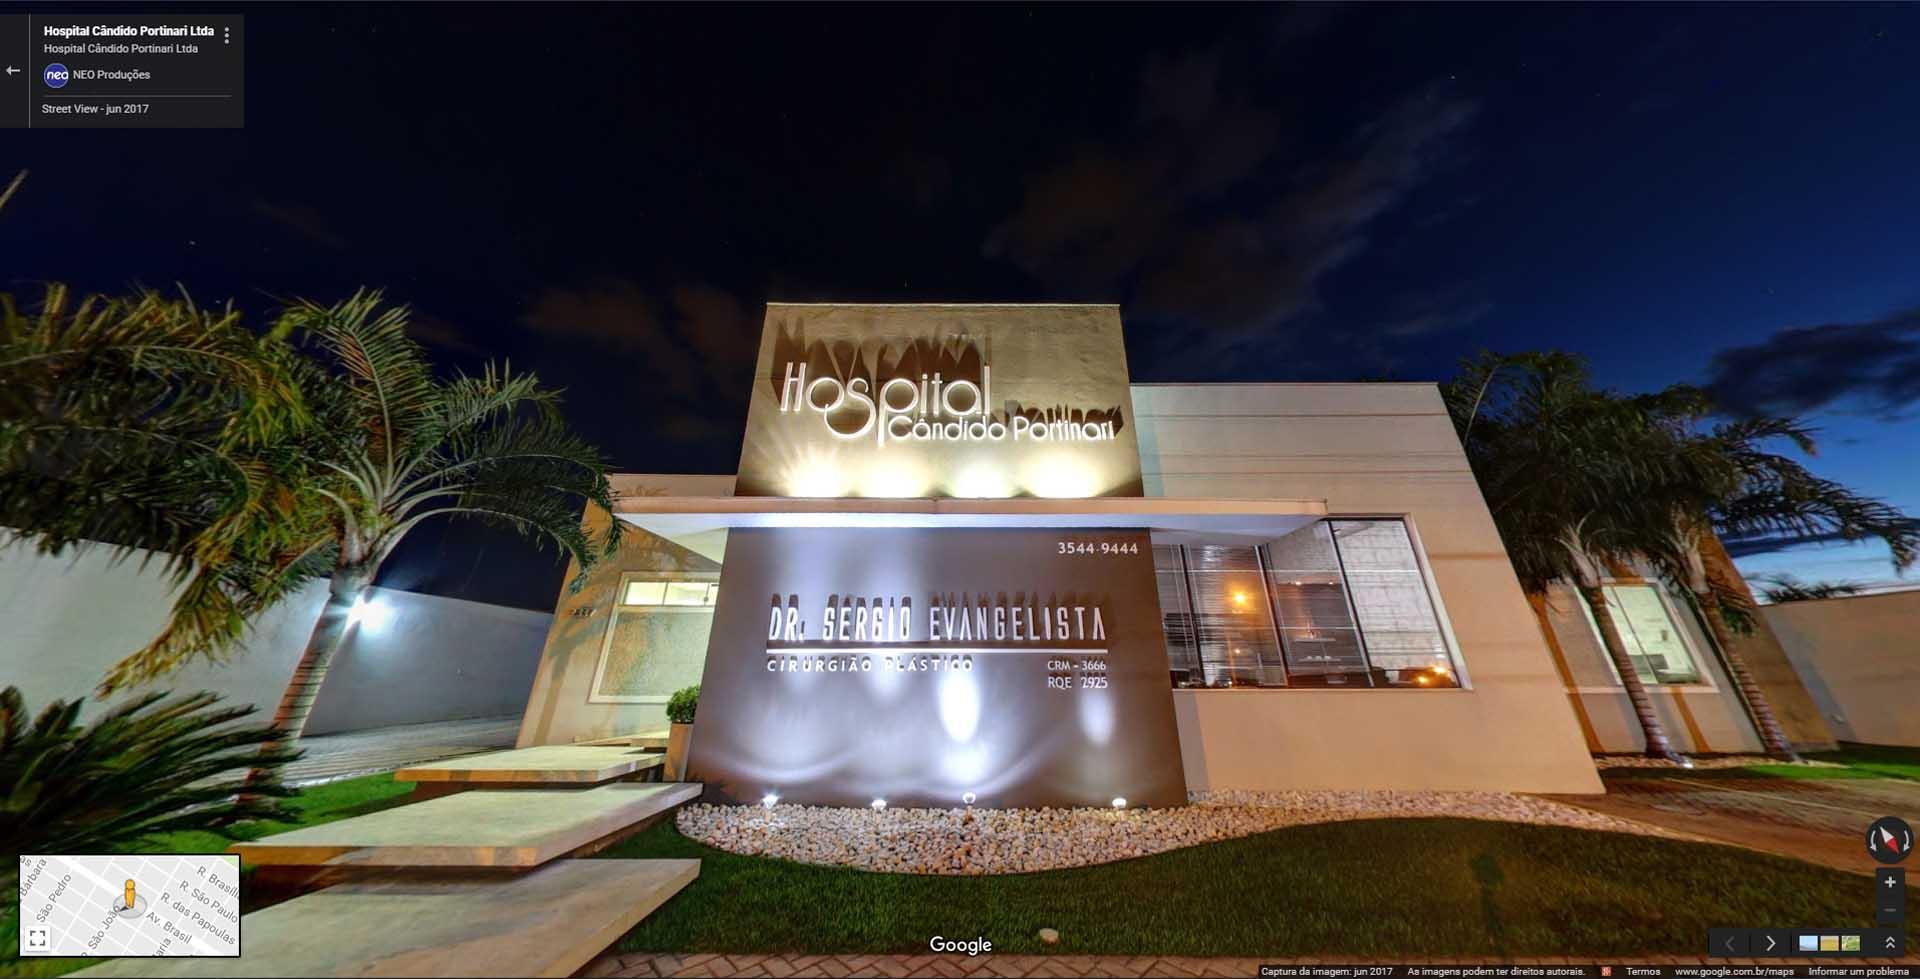 Hospital Cândido Portinari